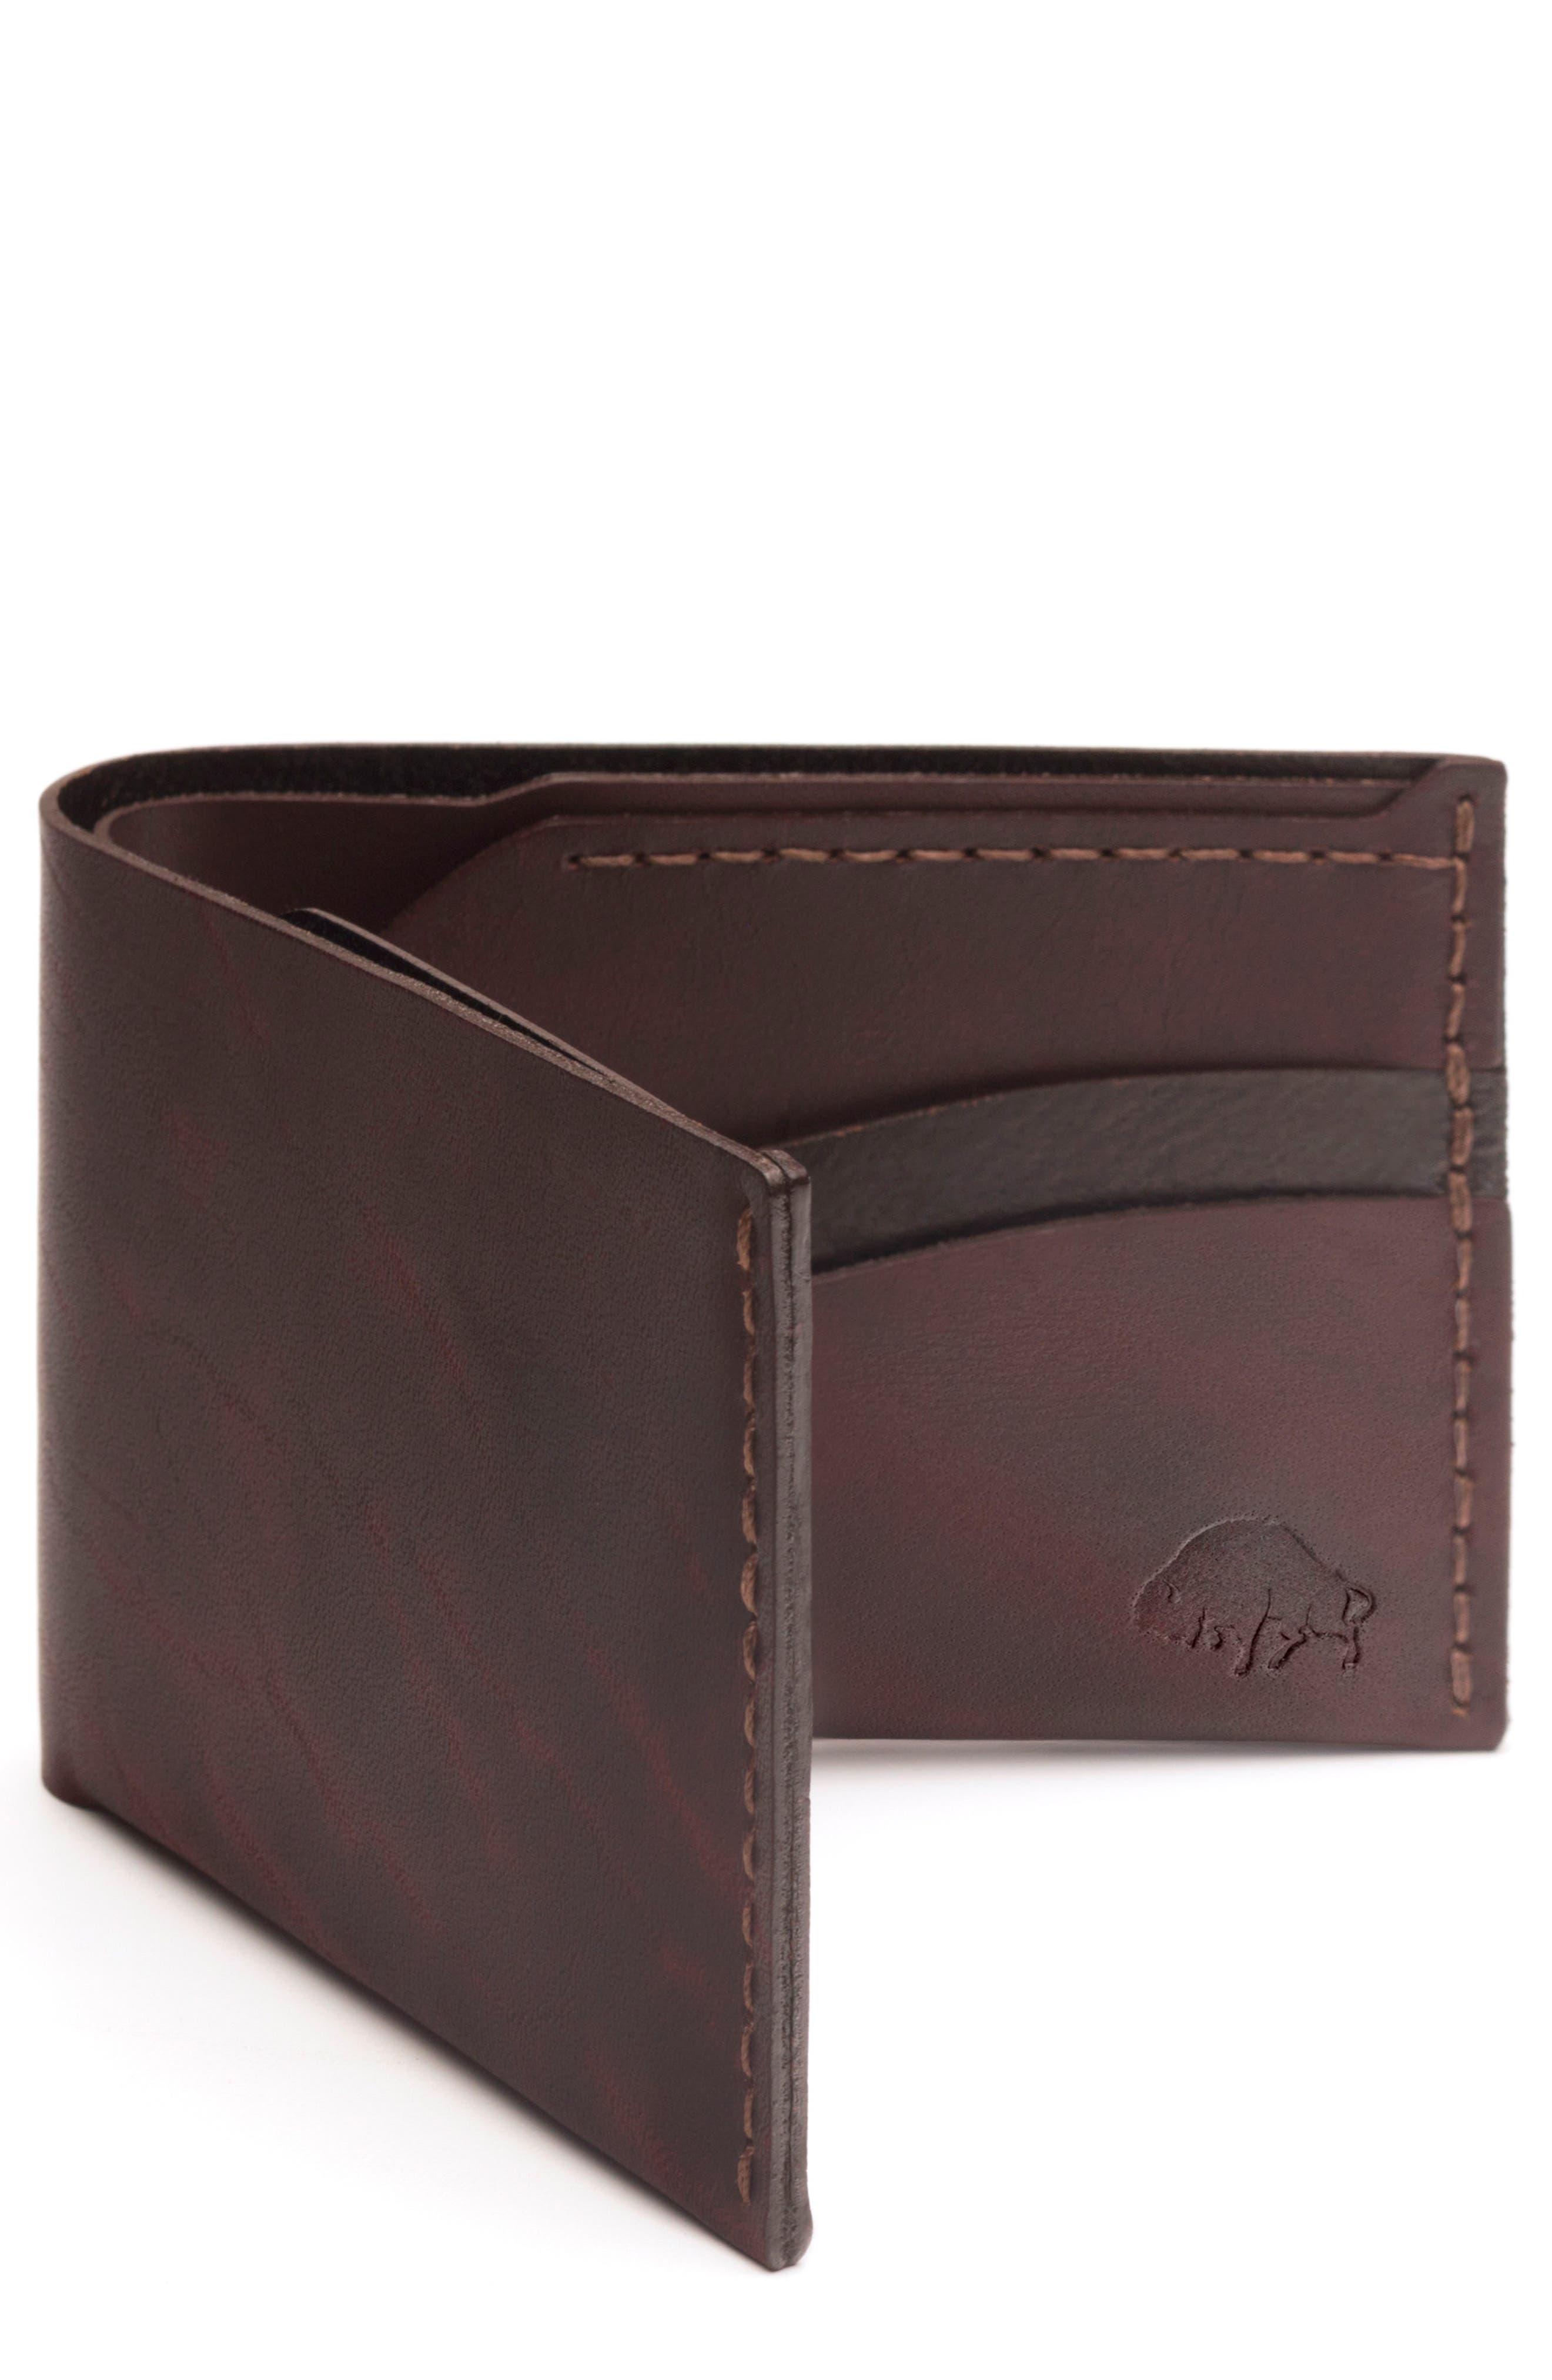 No. 6 Leather Wallet,                             Main thumbnail 1, color,                             Malbec